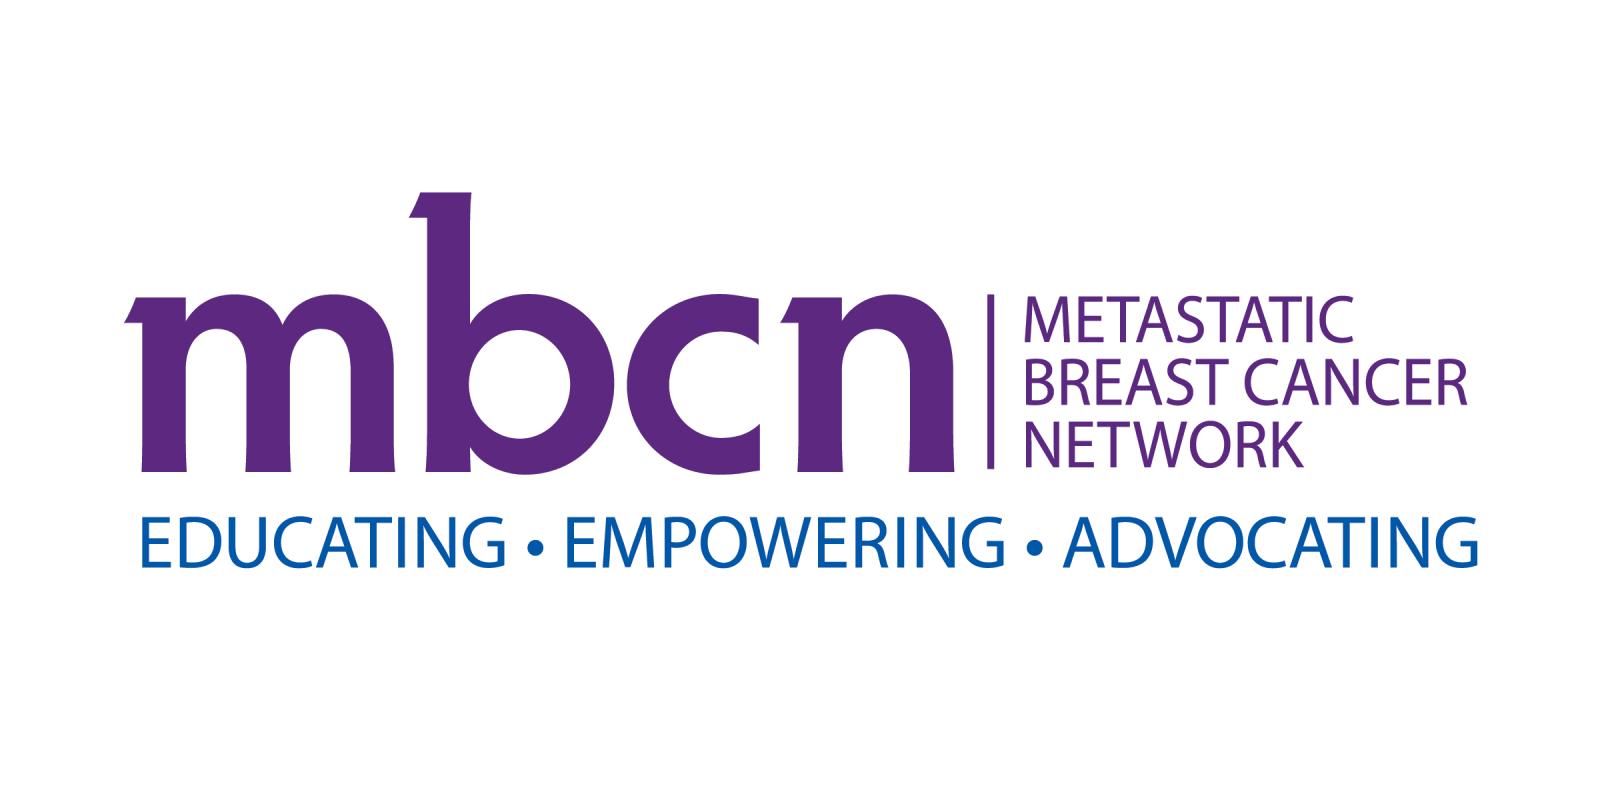 Metastatic Breast Cancer Network